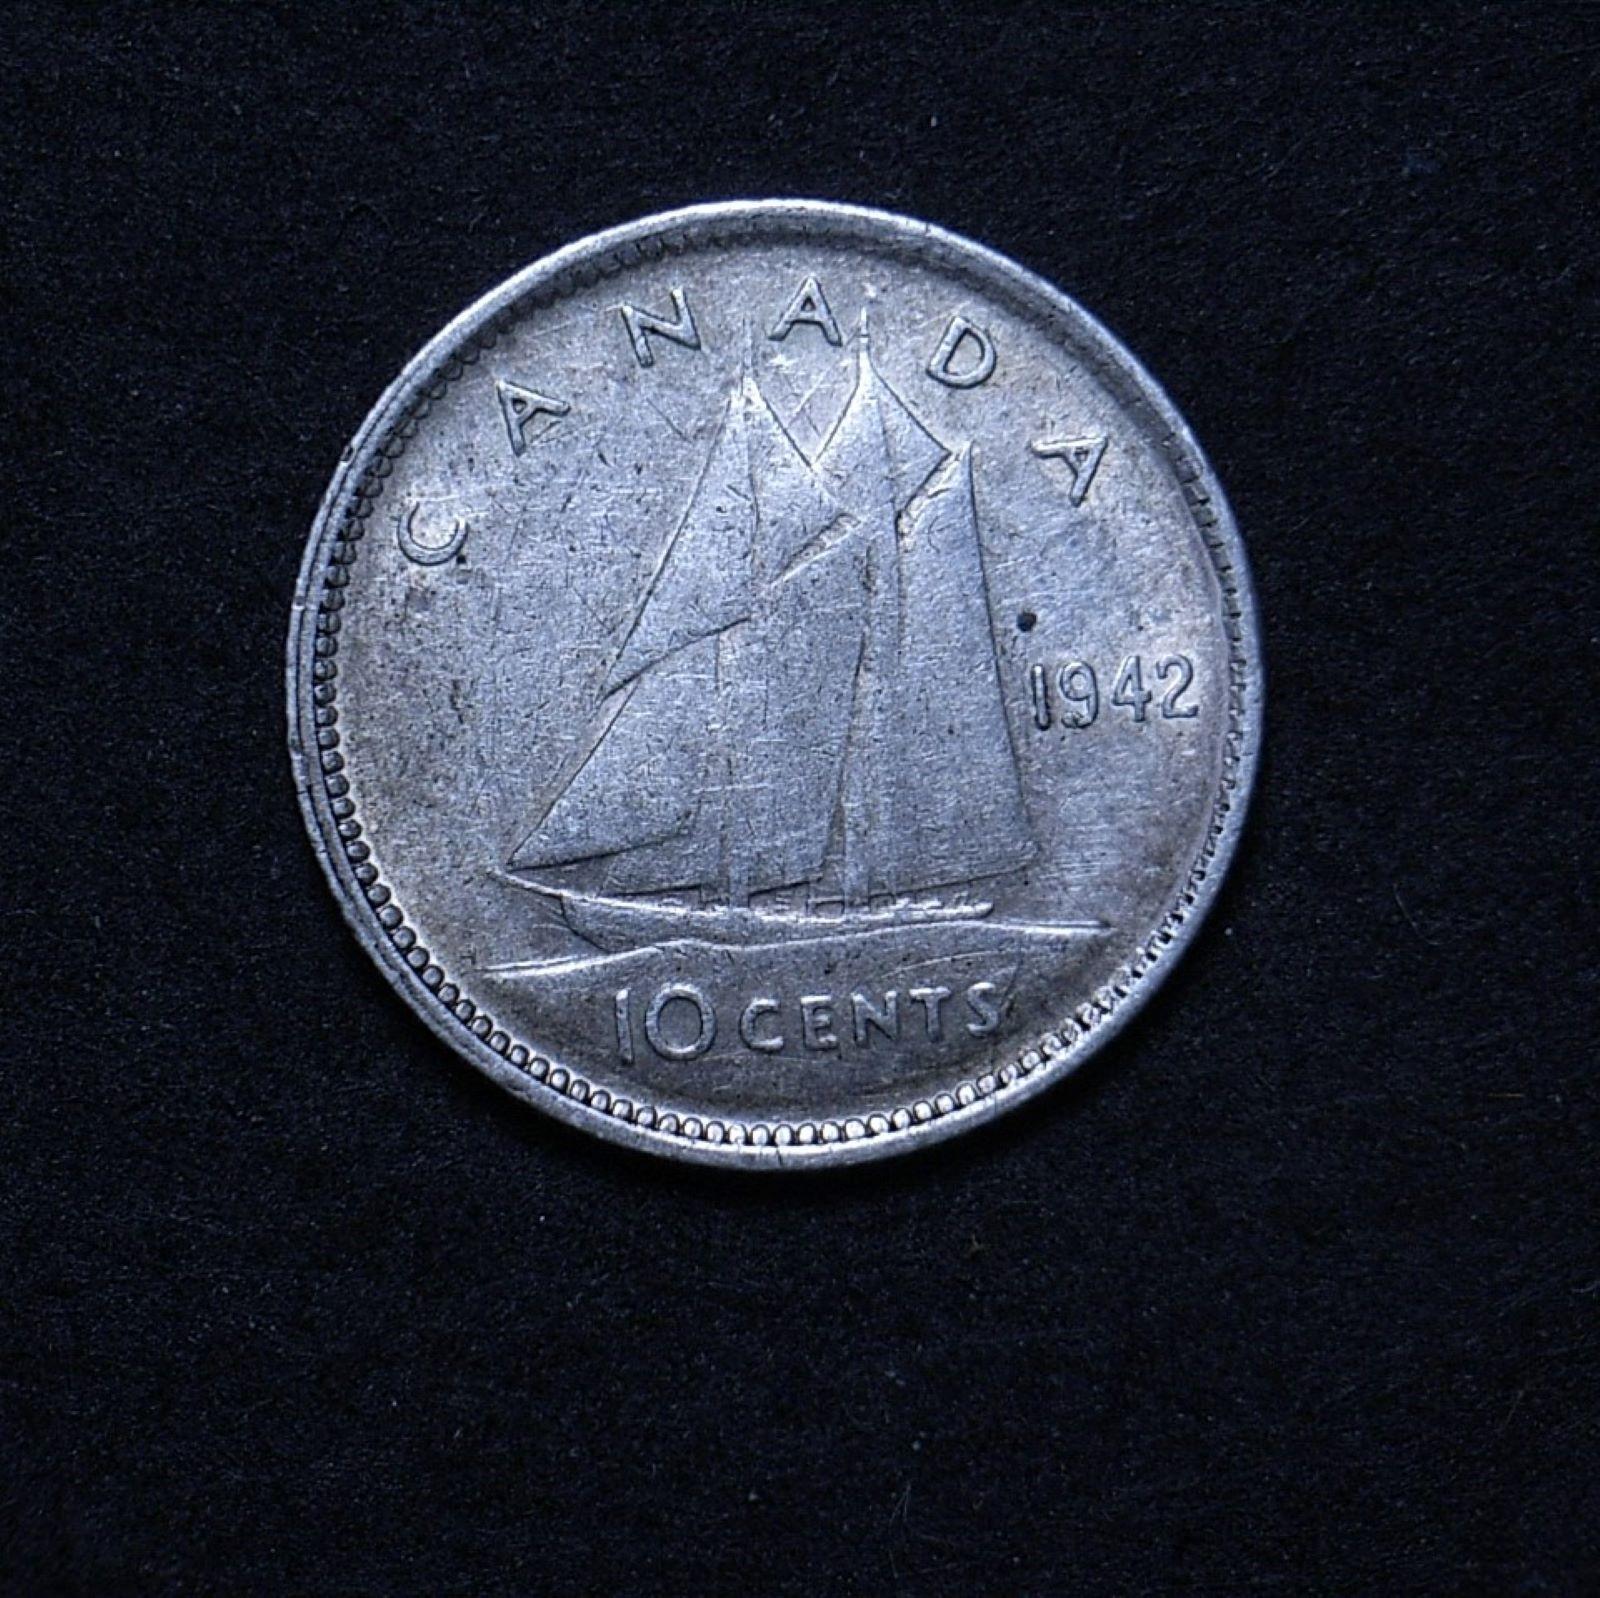 Canada 10 cents 1942 rev 1